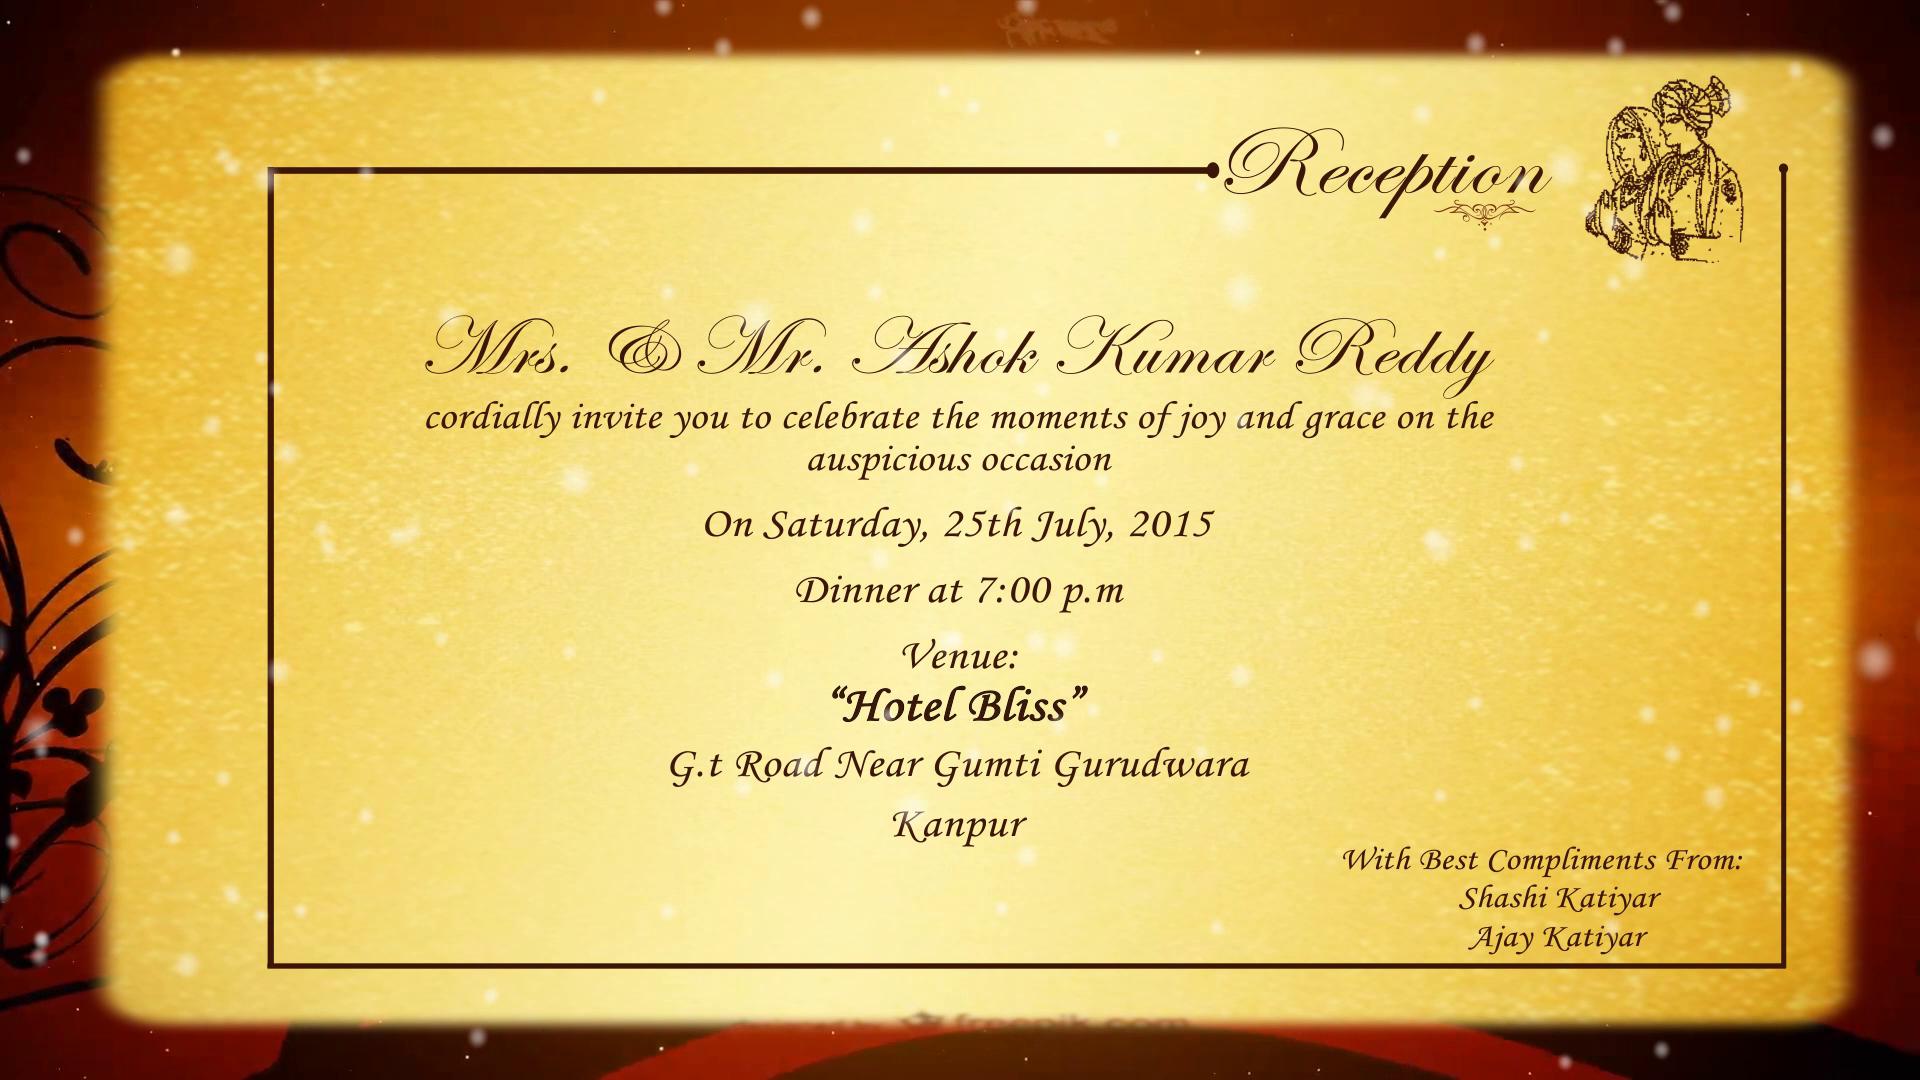 Image for Animated Wedding Invitations   sachin   Pinterest ...